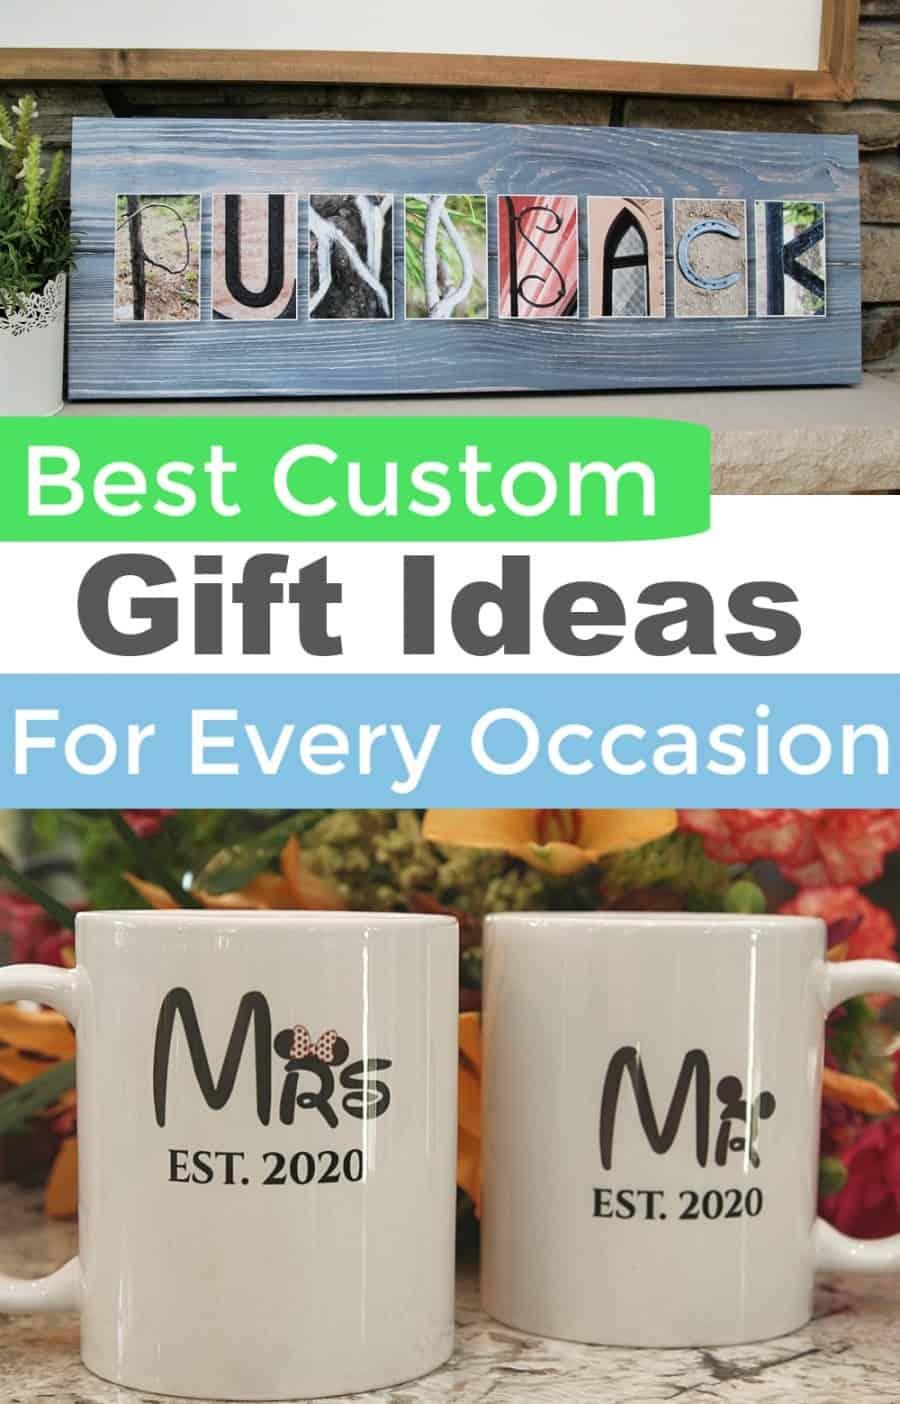 365Canvas Custom Gift Ideas - Canvas Prints, Mugs, & Desktop Plaques {+ Discount Code} 14